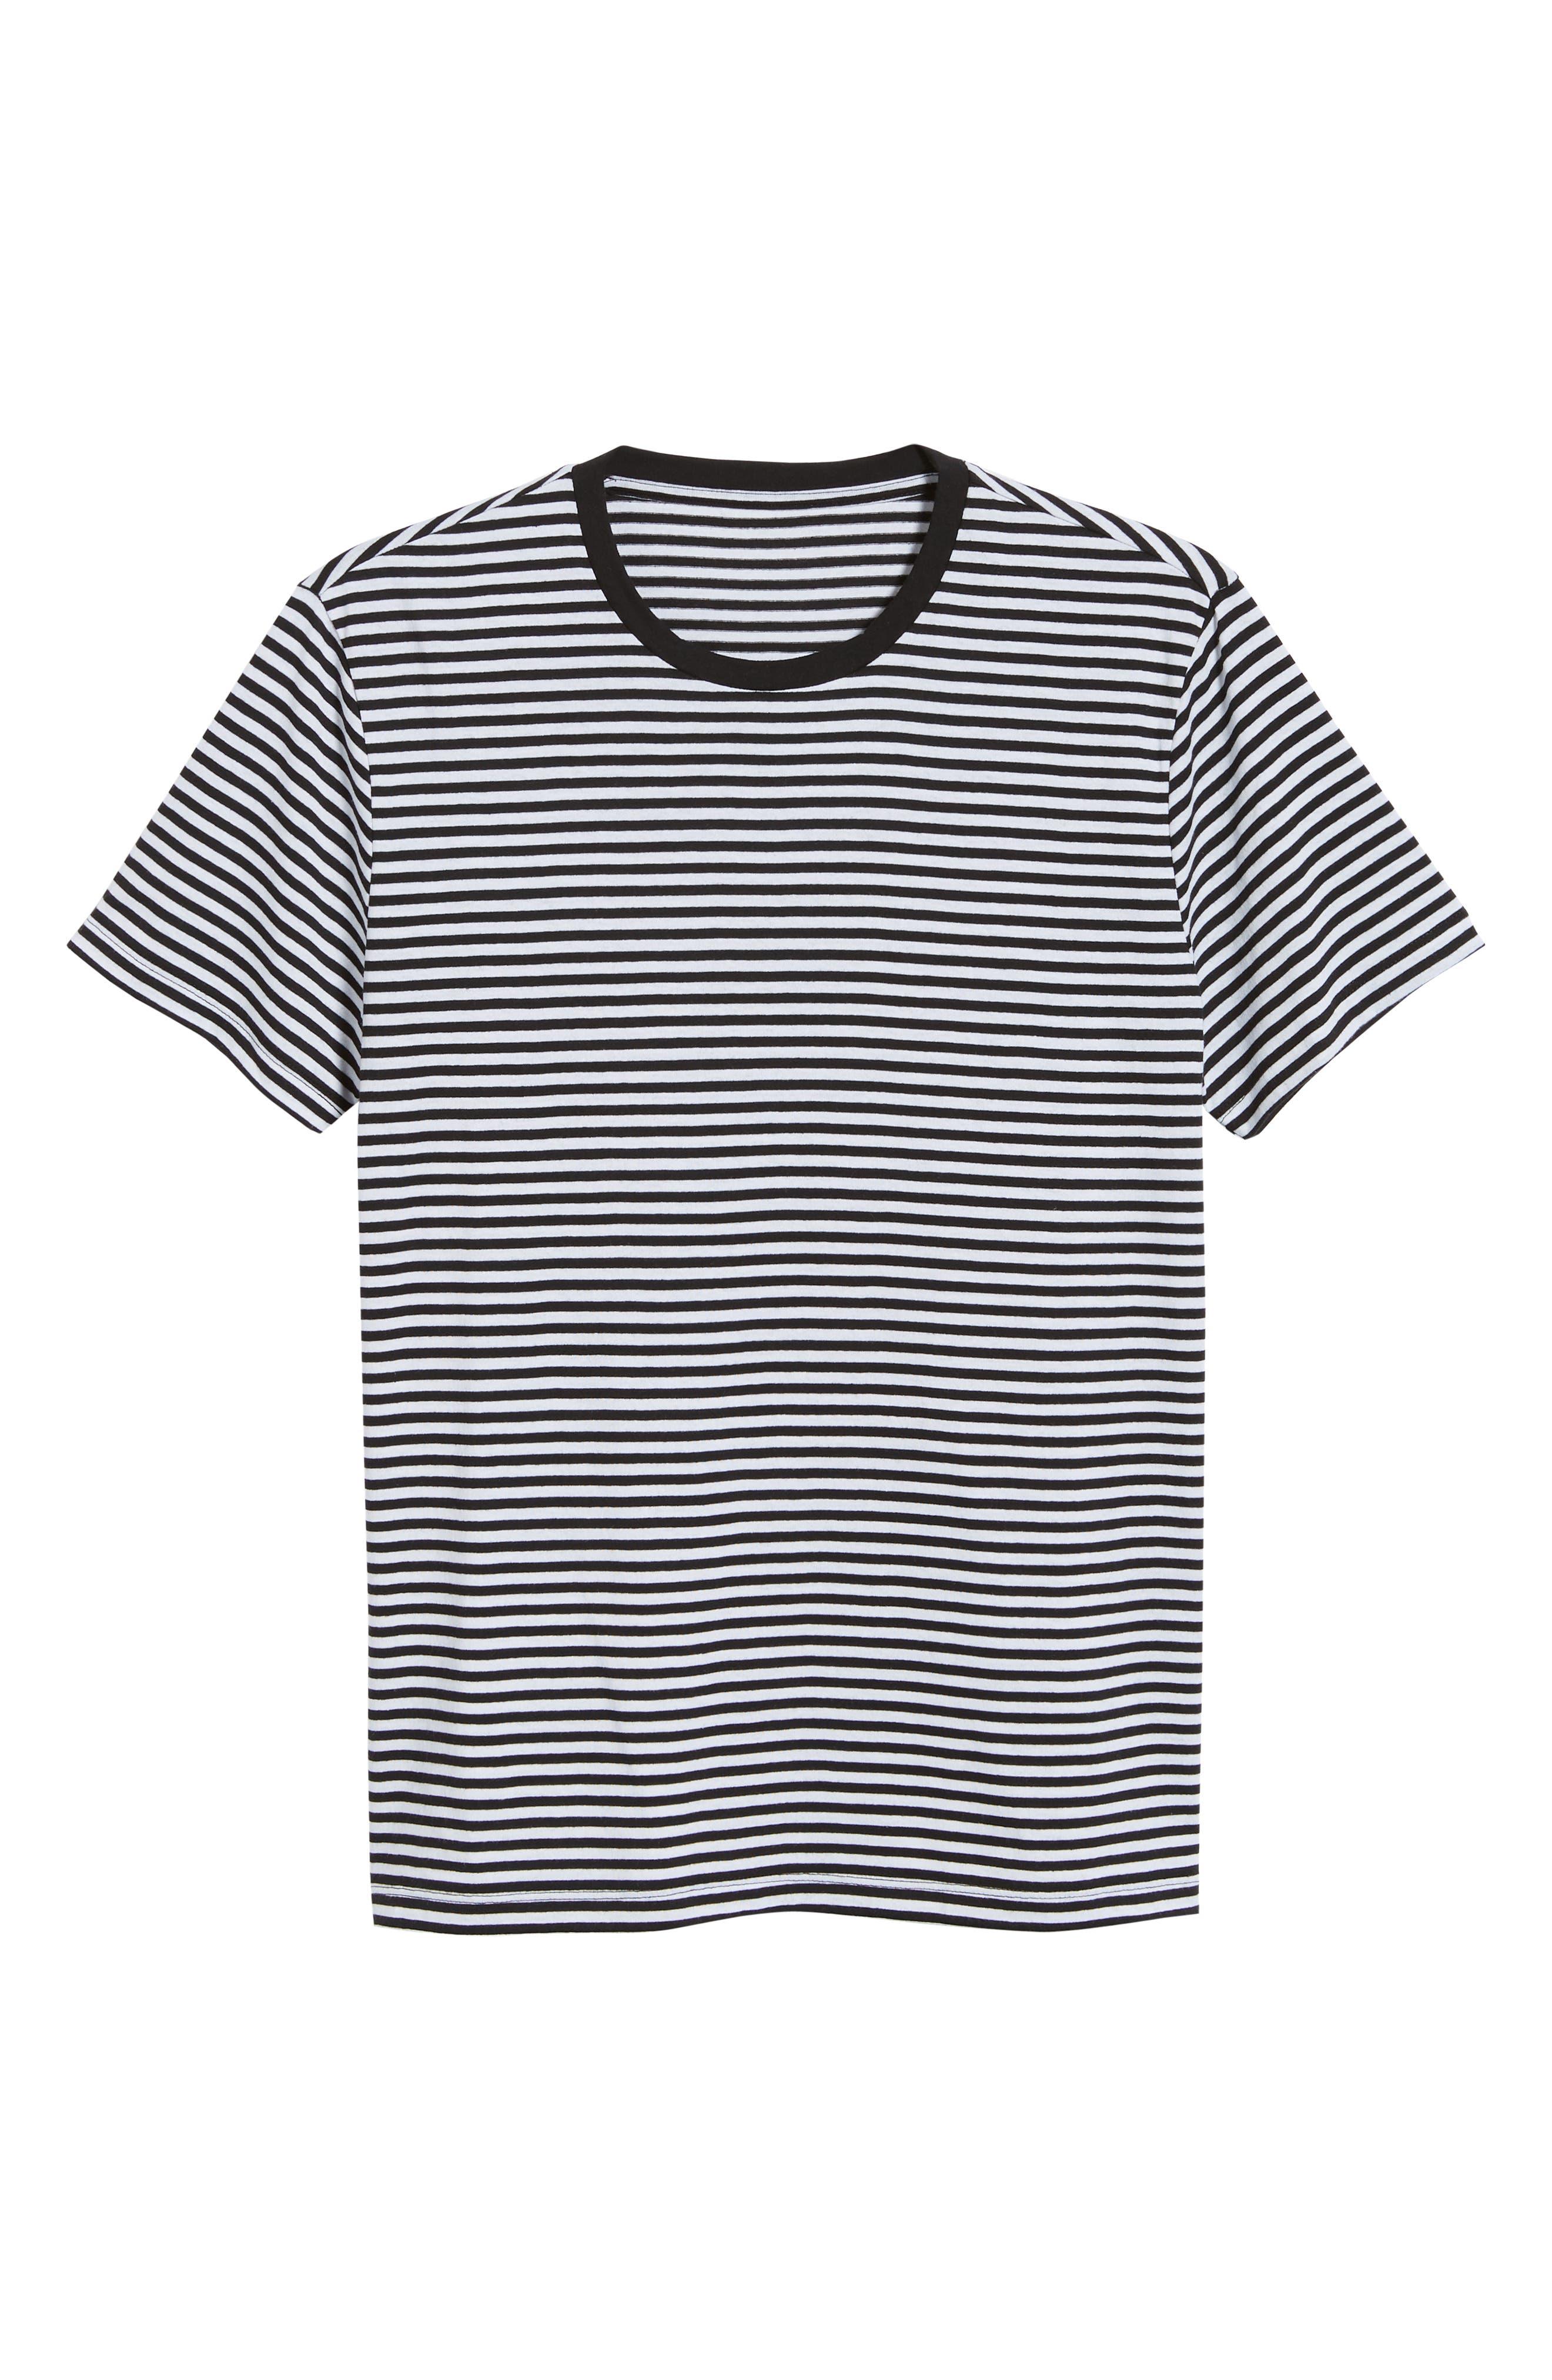 Stripe Crewneck T-Shirt,                             Alternate thumbnail 6, color,                             BLACK ROCK - WHITE STRIPE